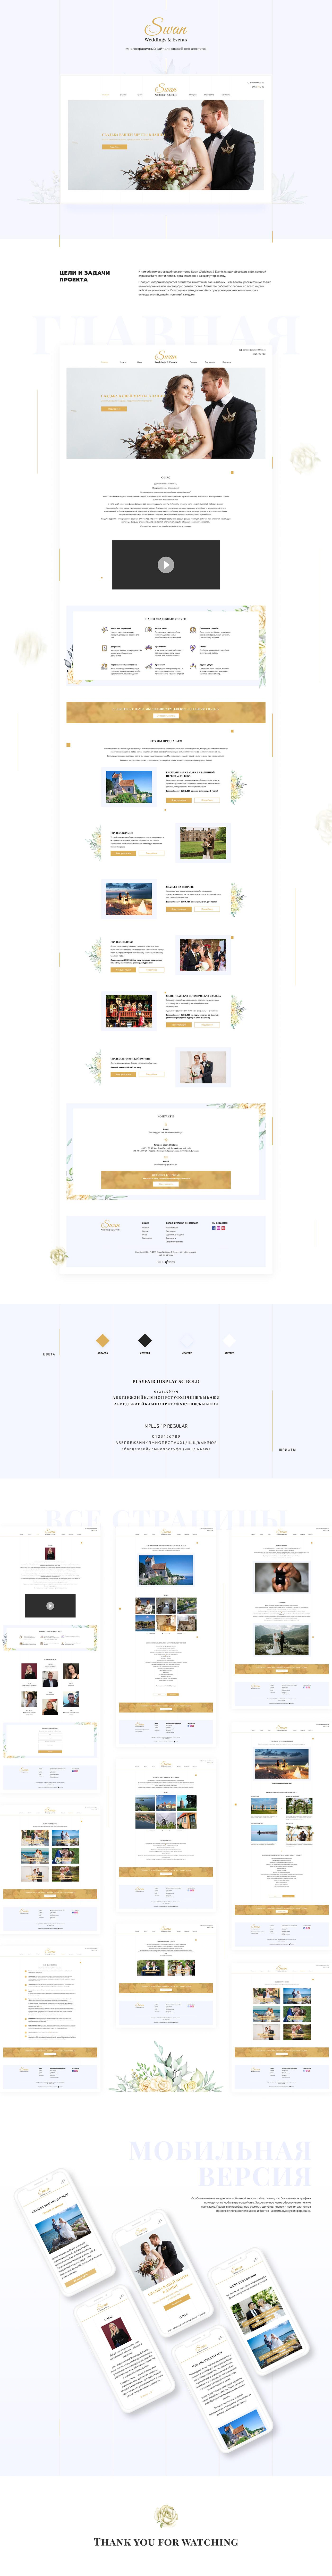 Website wedding Web Minimalism design UI Event site ux